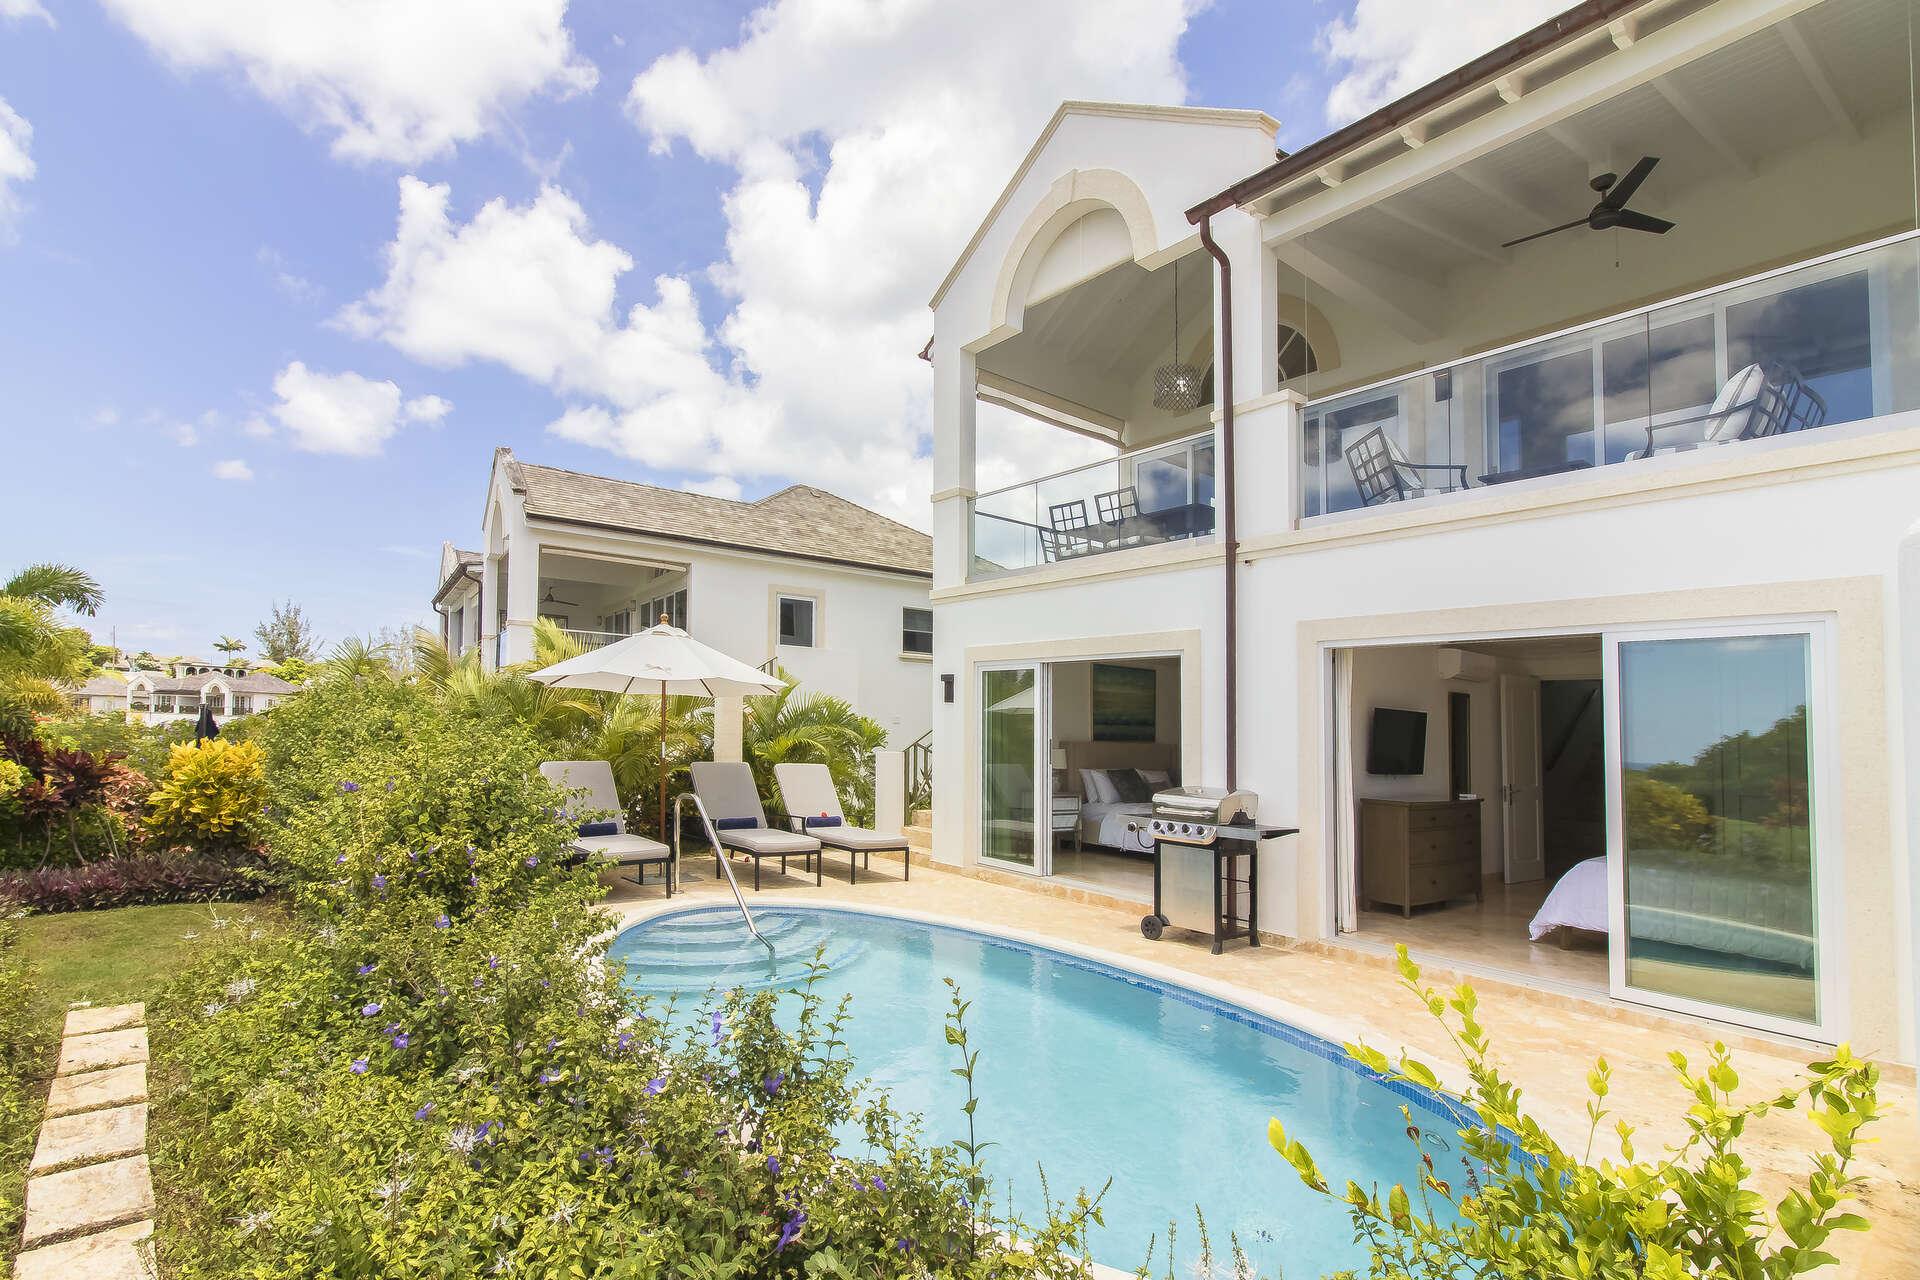 Luxury villa rentals caribbean - Barbados - St james - Royal westmoreland golf resort - Sugar Cane Mews 4 - Image 1/11